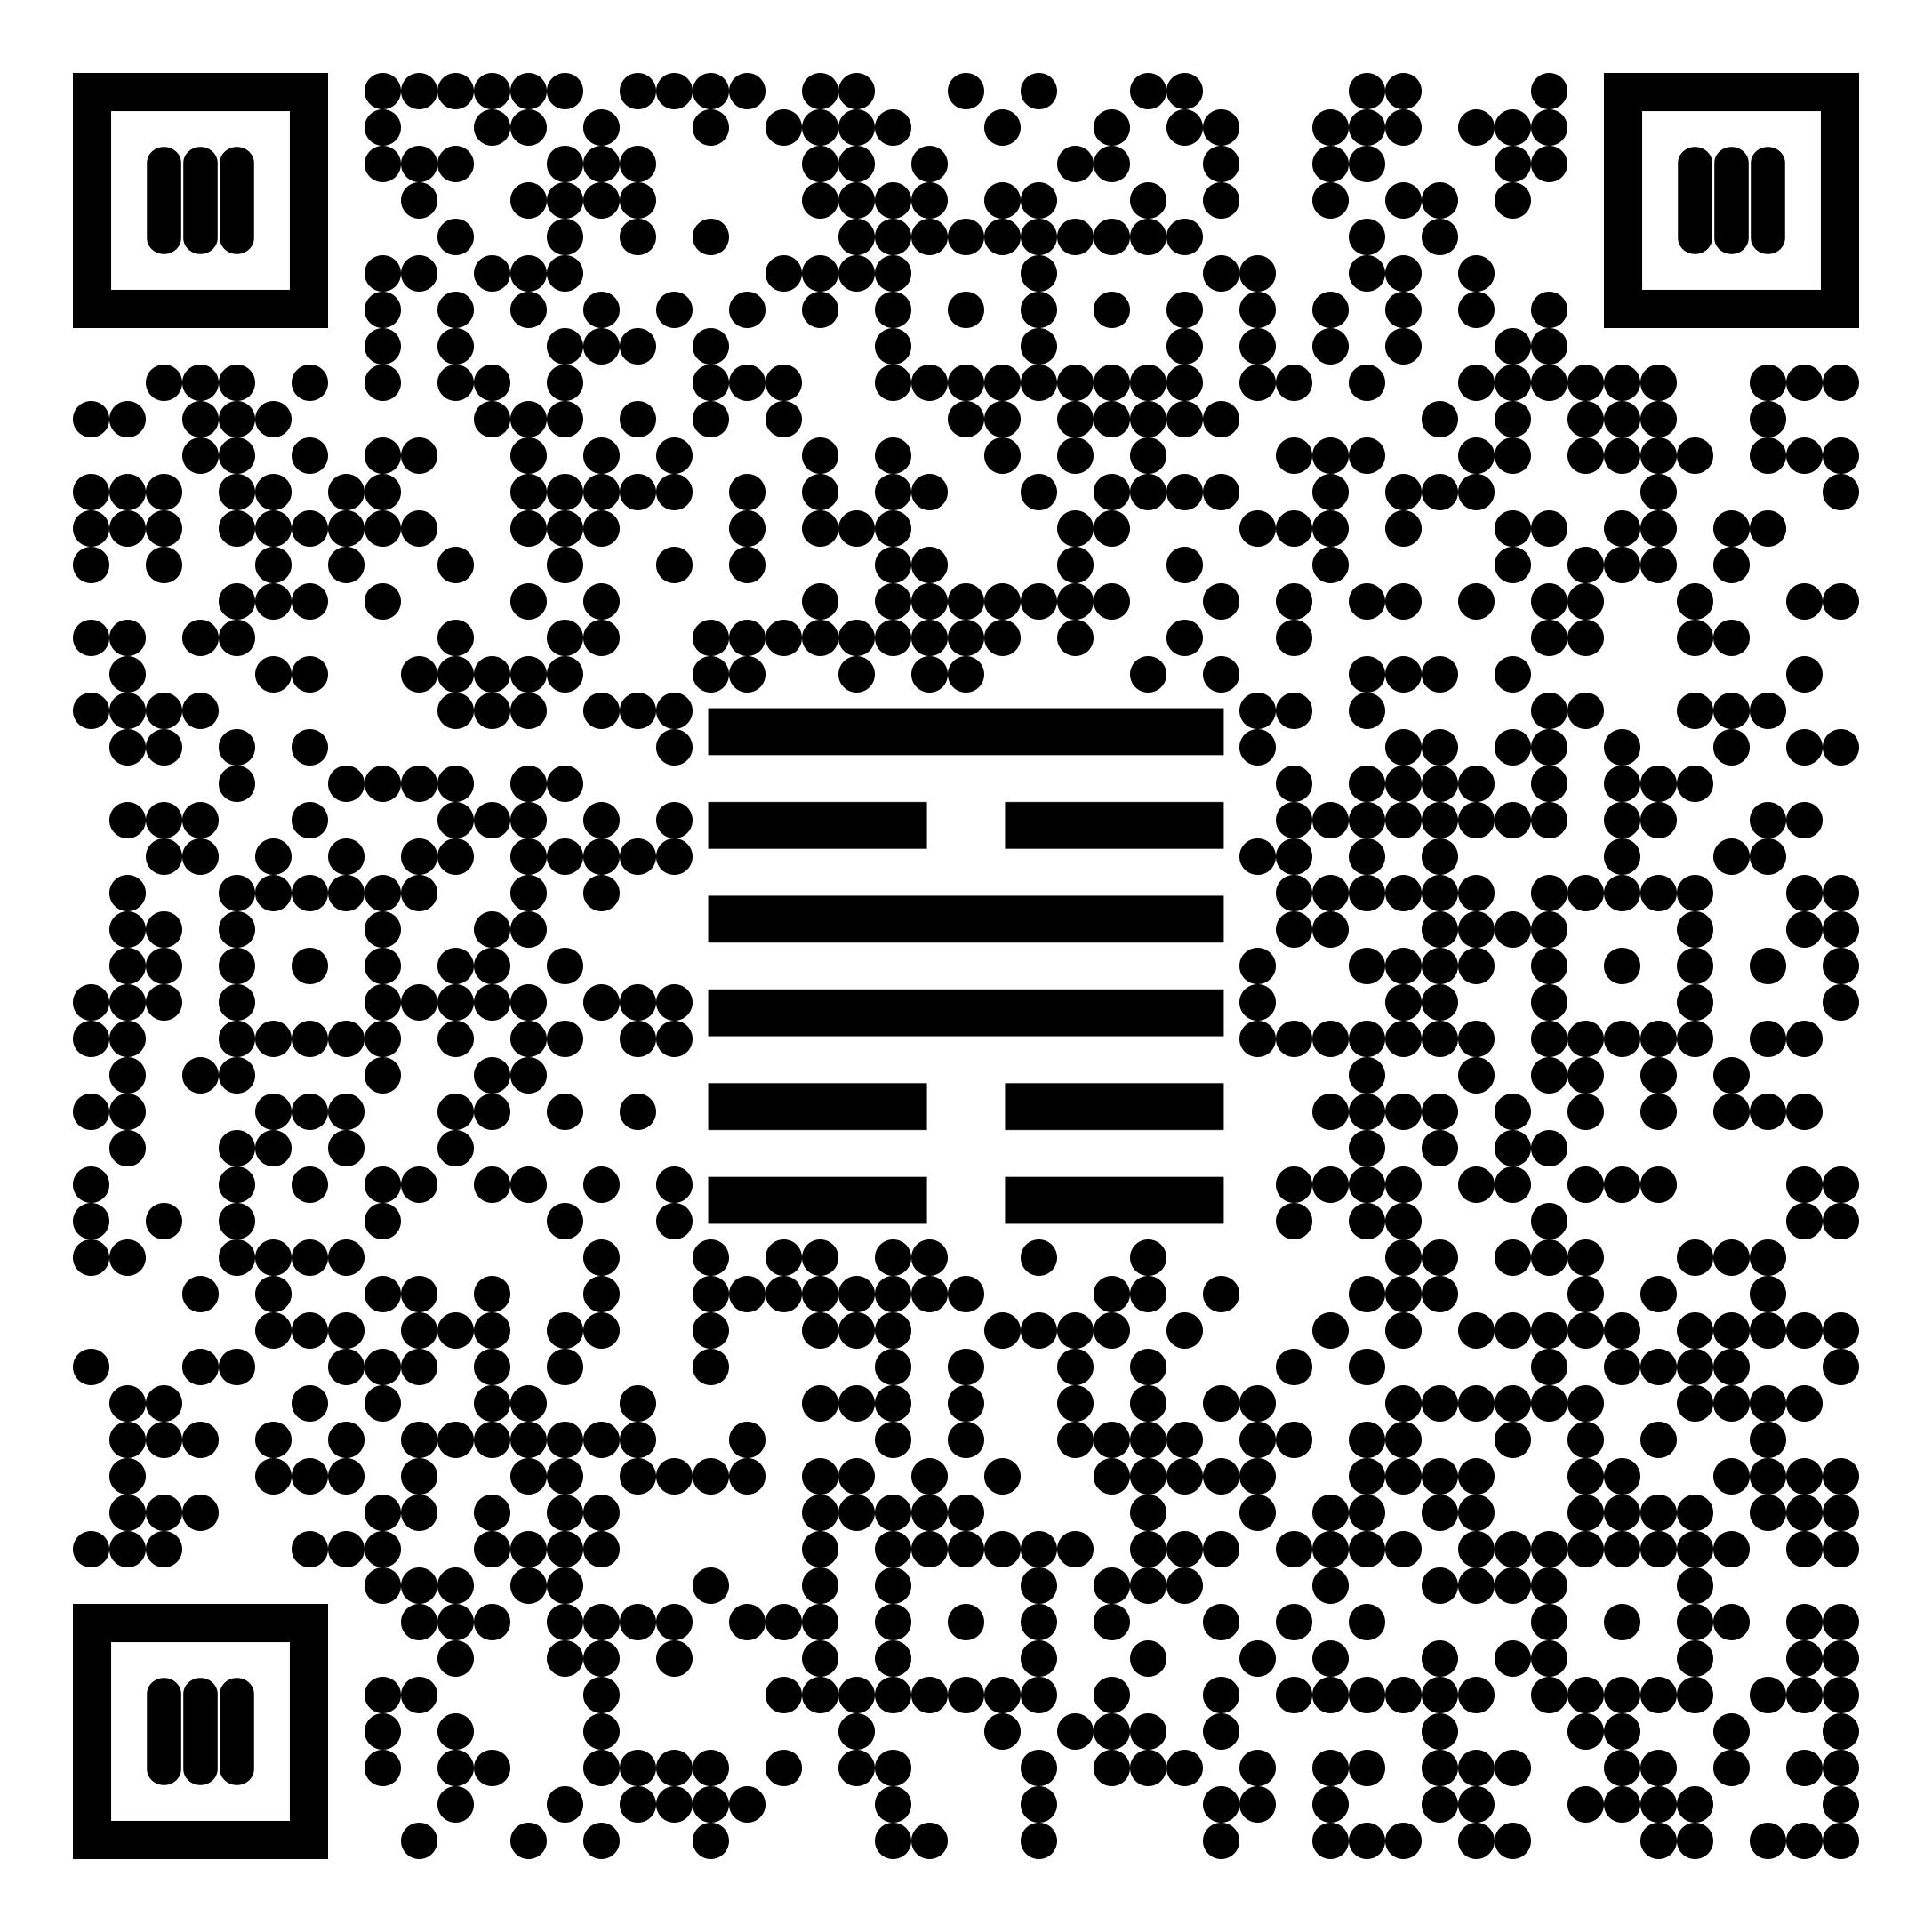 qr-code-56.png